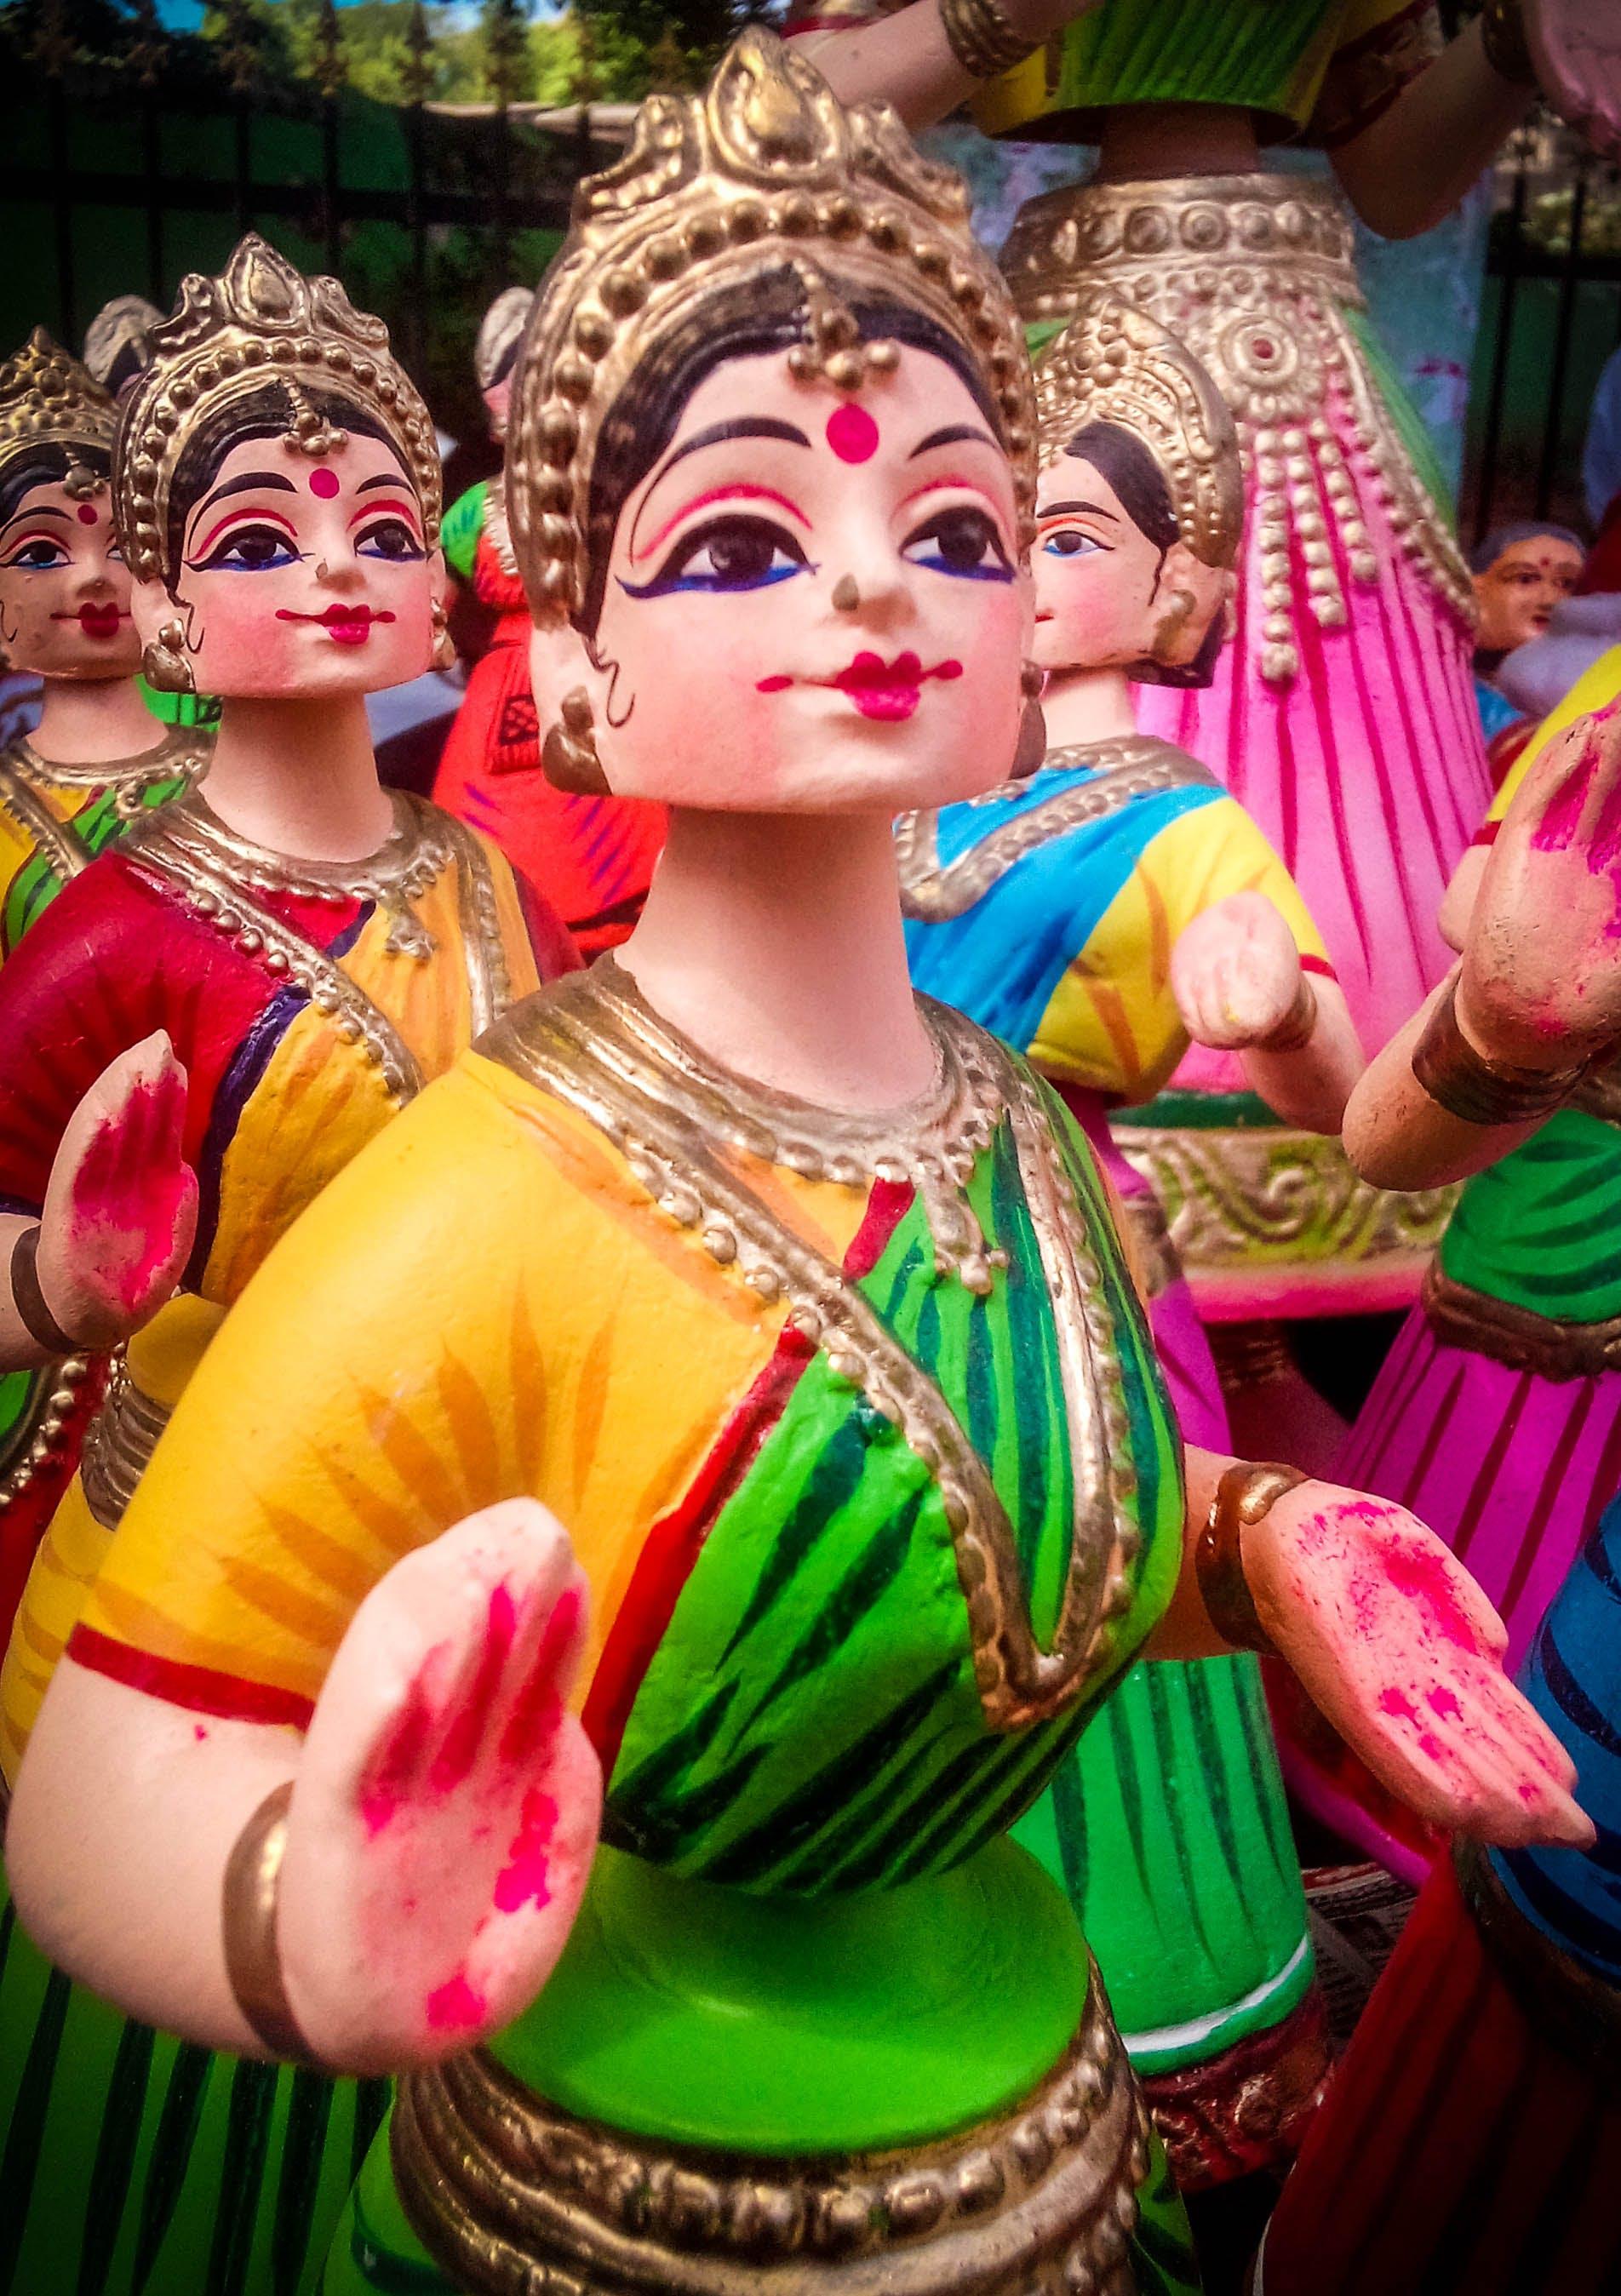 Free stock photo of doll, handmade, Thanjauvr thalaiyaati bommai, thanjavur doll